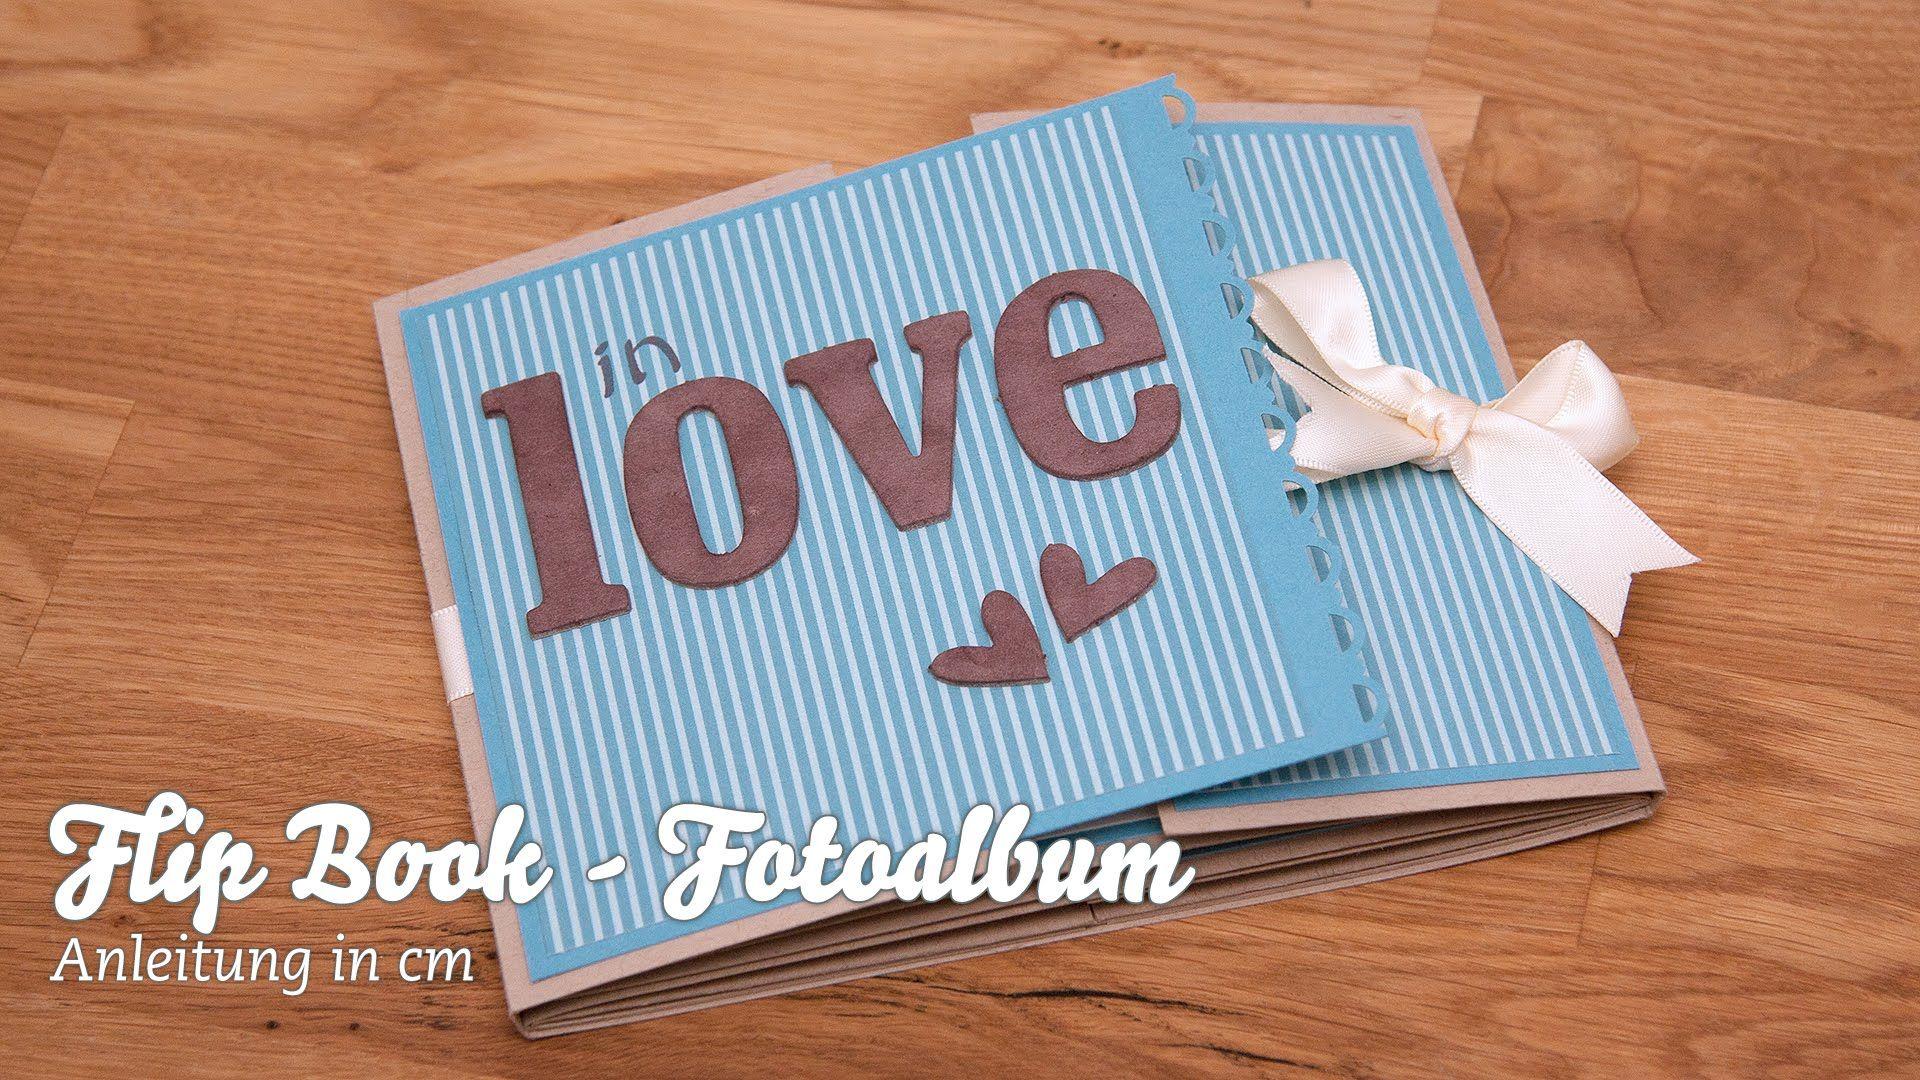 flip book fotoalbum selber basteln crafts videos bastelarbeiten videos pinterest album. Black Bedroom Furniture Sets. Home Design Ideas